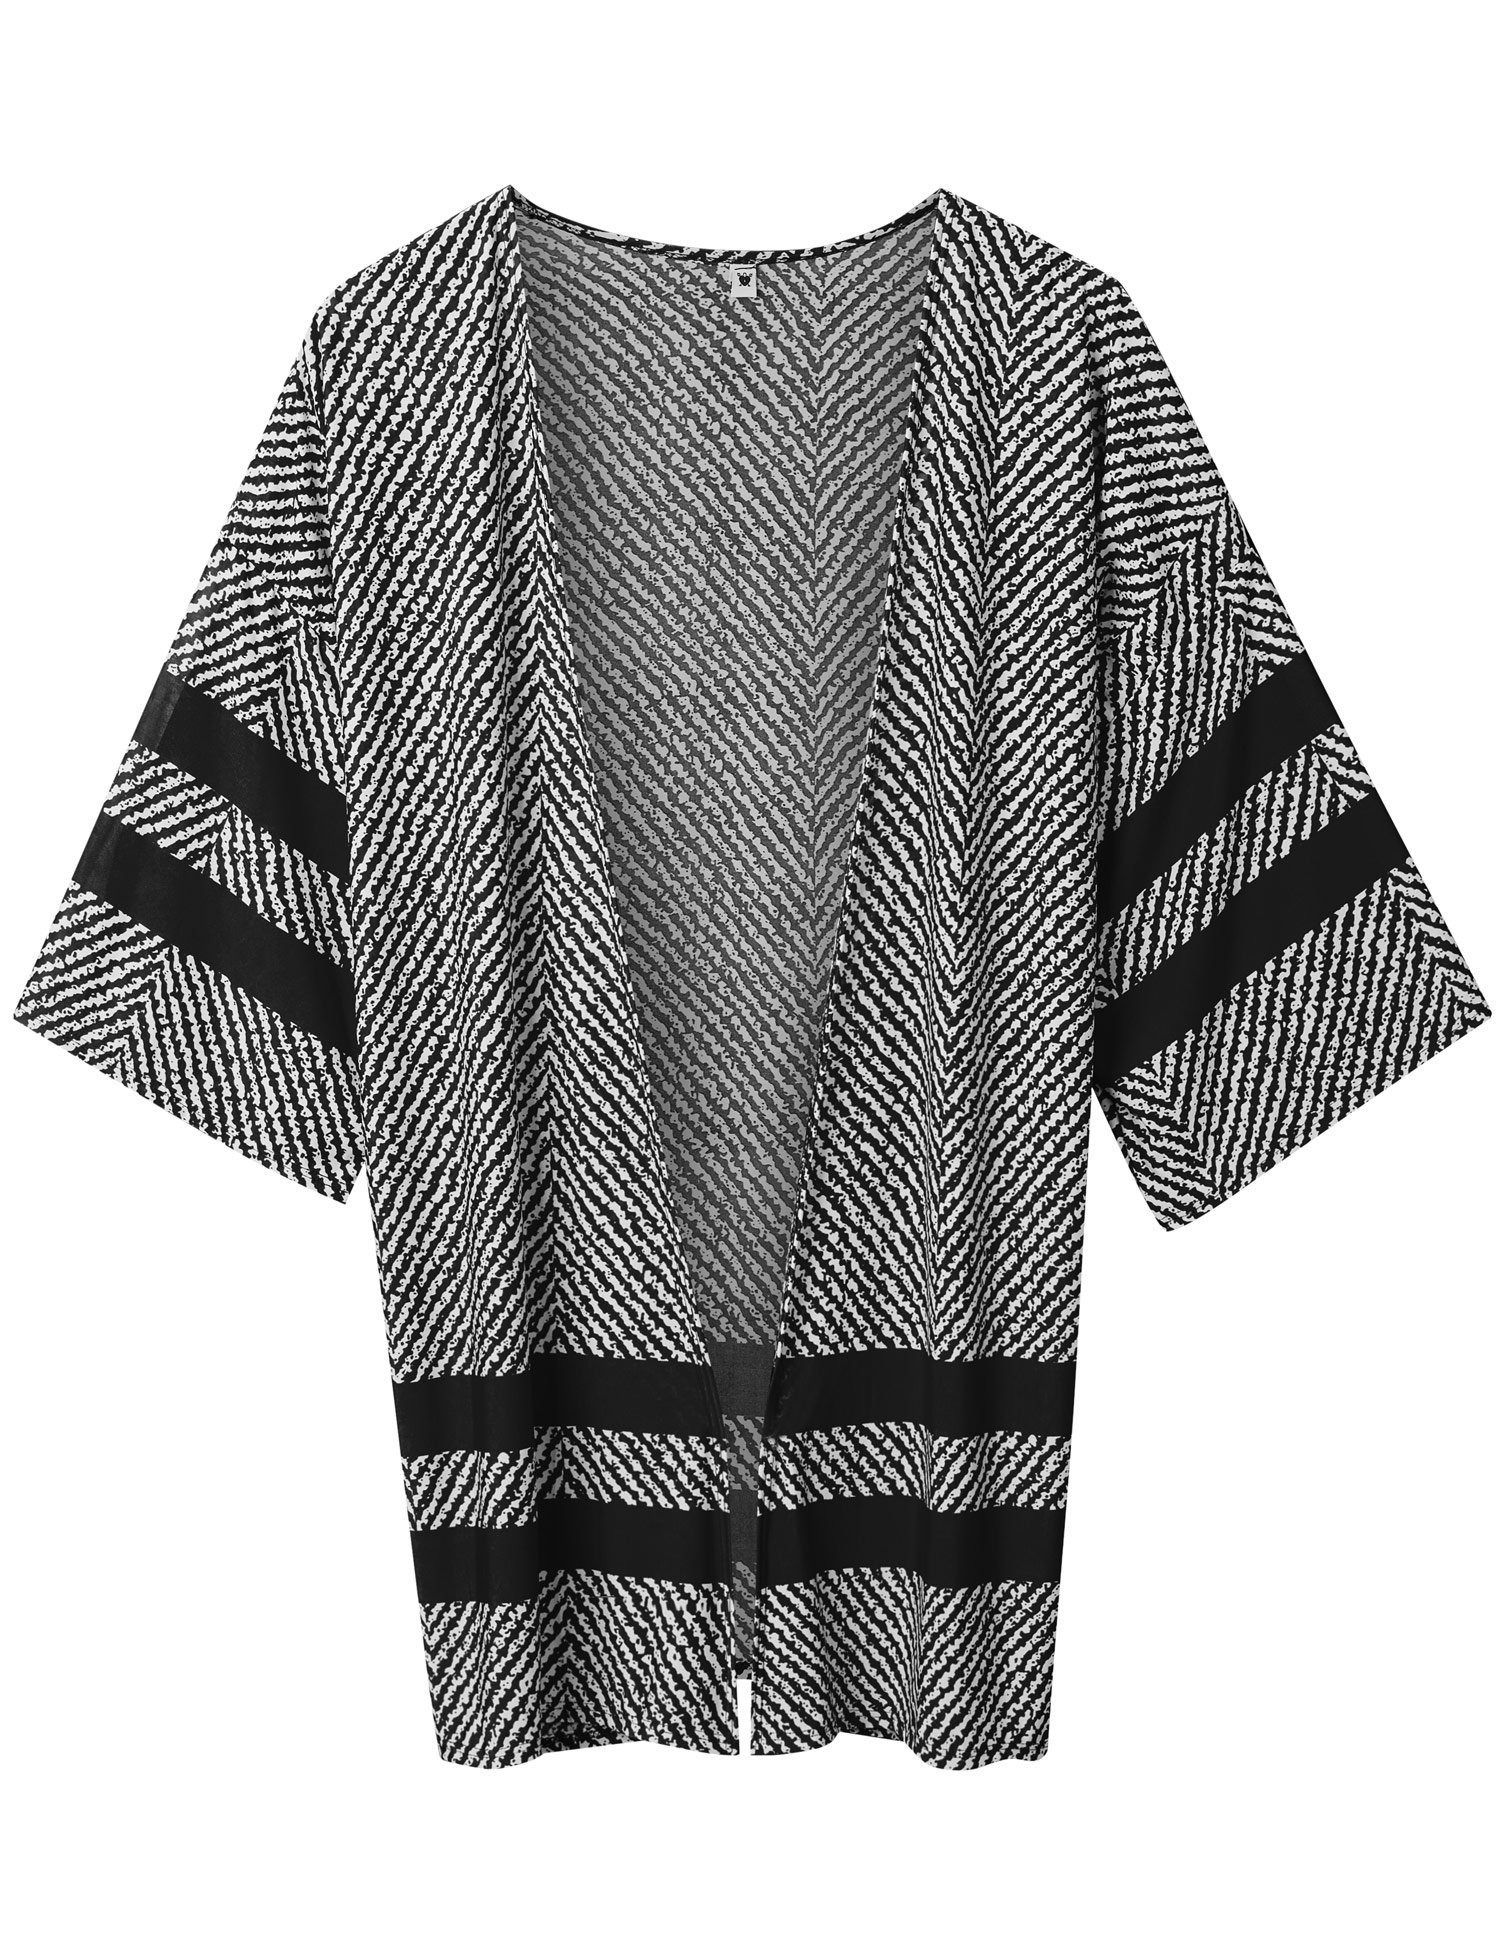 Lock and Love WT1576 Womens Printed Kimono Shawl Cardigan Top - Made in USA OS White_Black